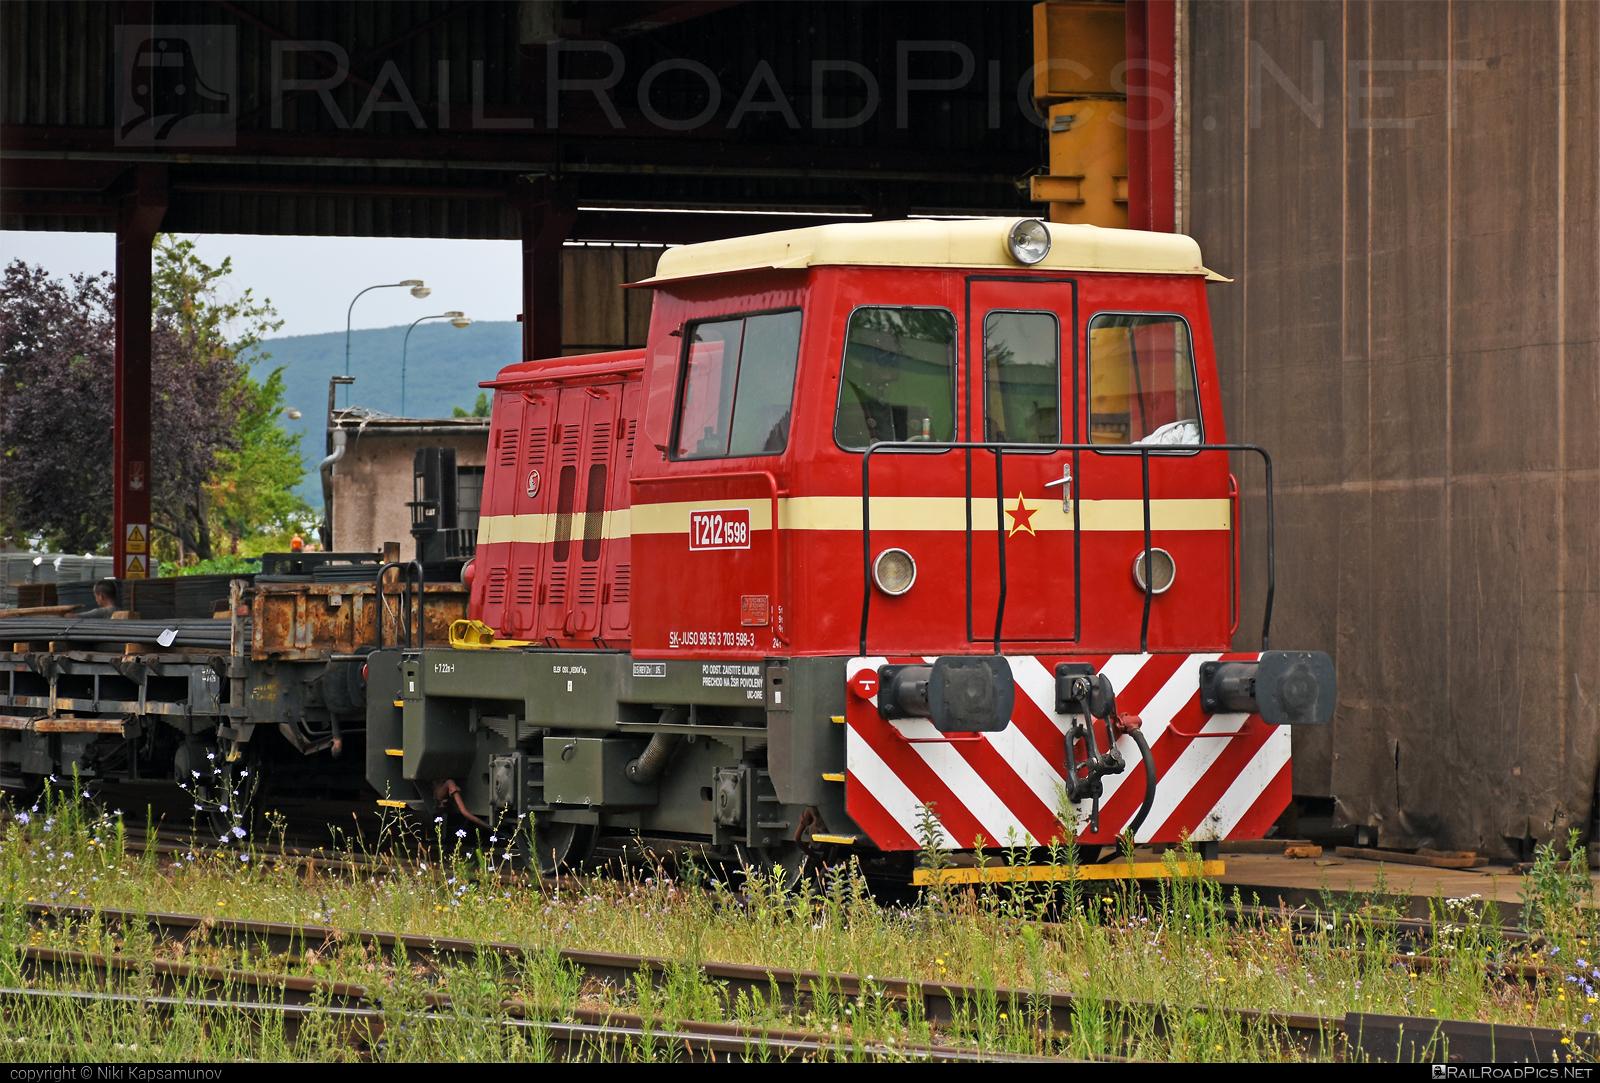 Turčianske strojárne Martin T 212.1 (703) - 703 598-3 operated by JUSO s.r.o. #juso #locomotive703 #locomotivet2121 #prasa #prasatko #prasiatko #raven #t2121 #turcianskestrojarnemartin